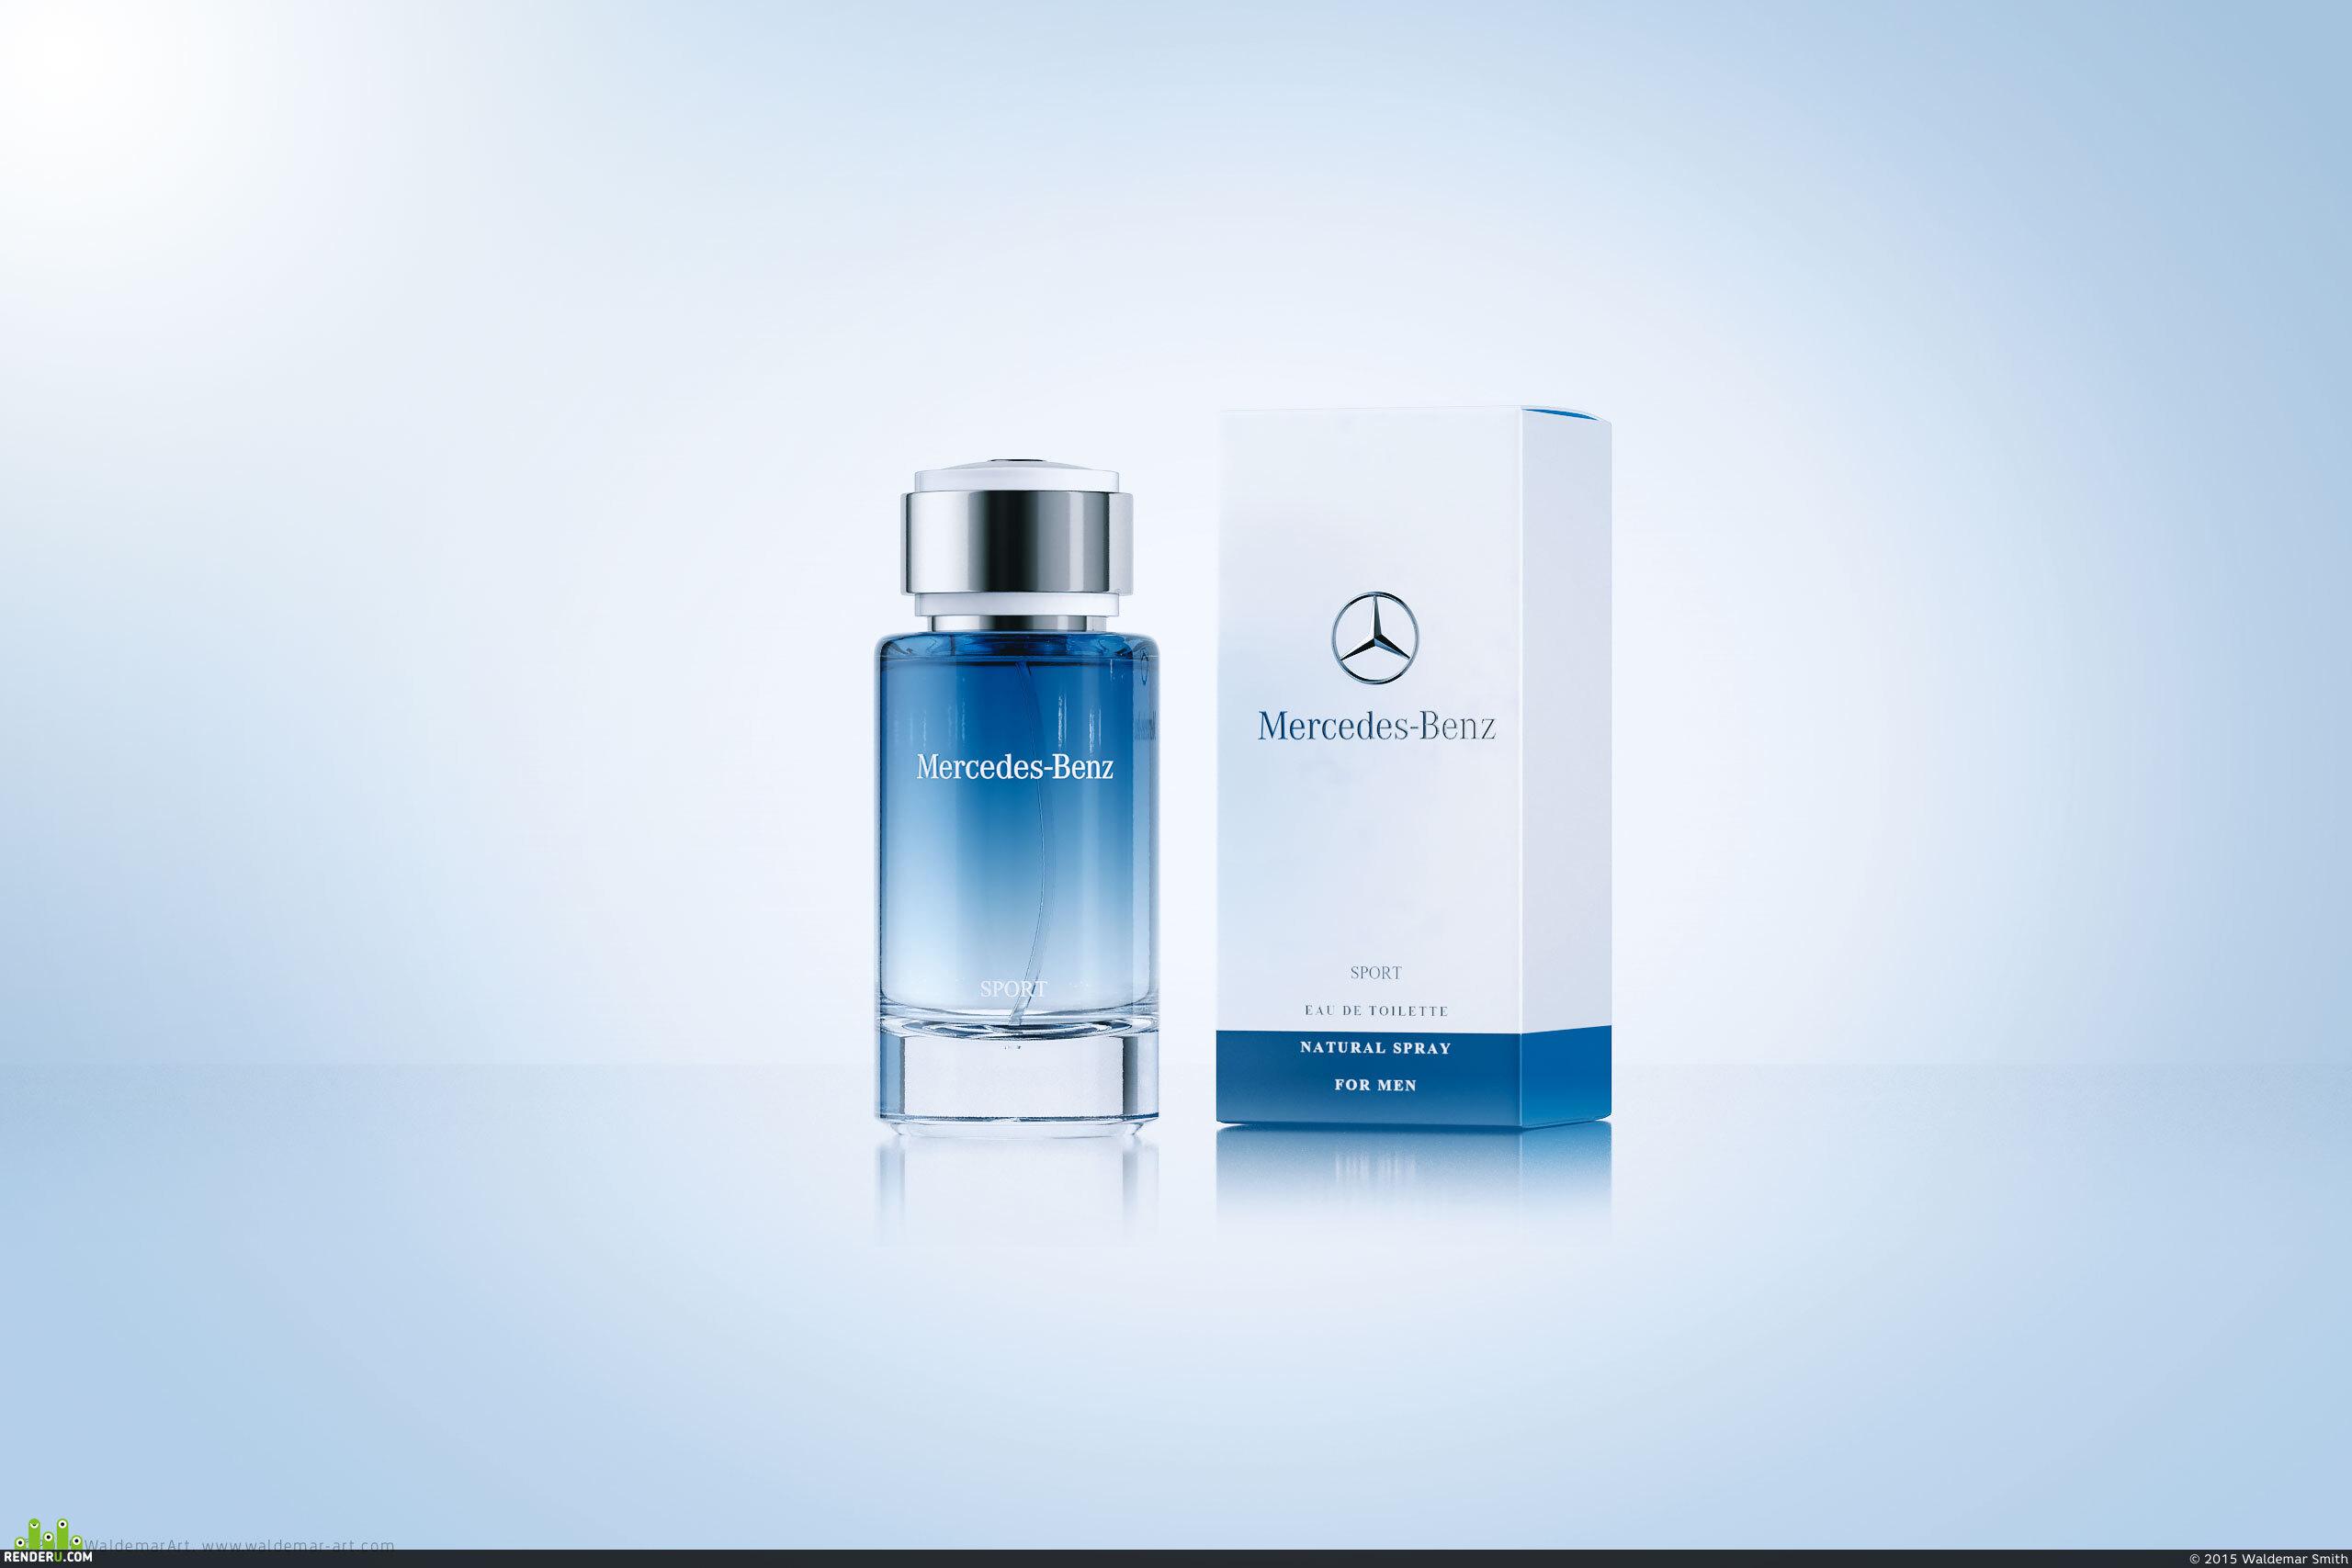 preview Парфюмерная вода Mercedes-Benz SPORT